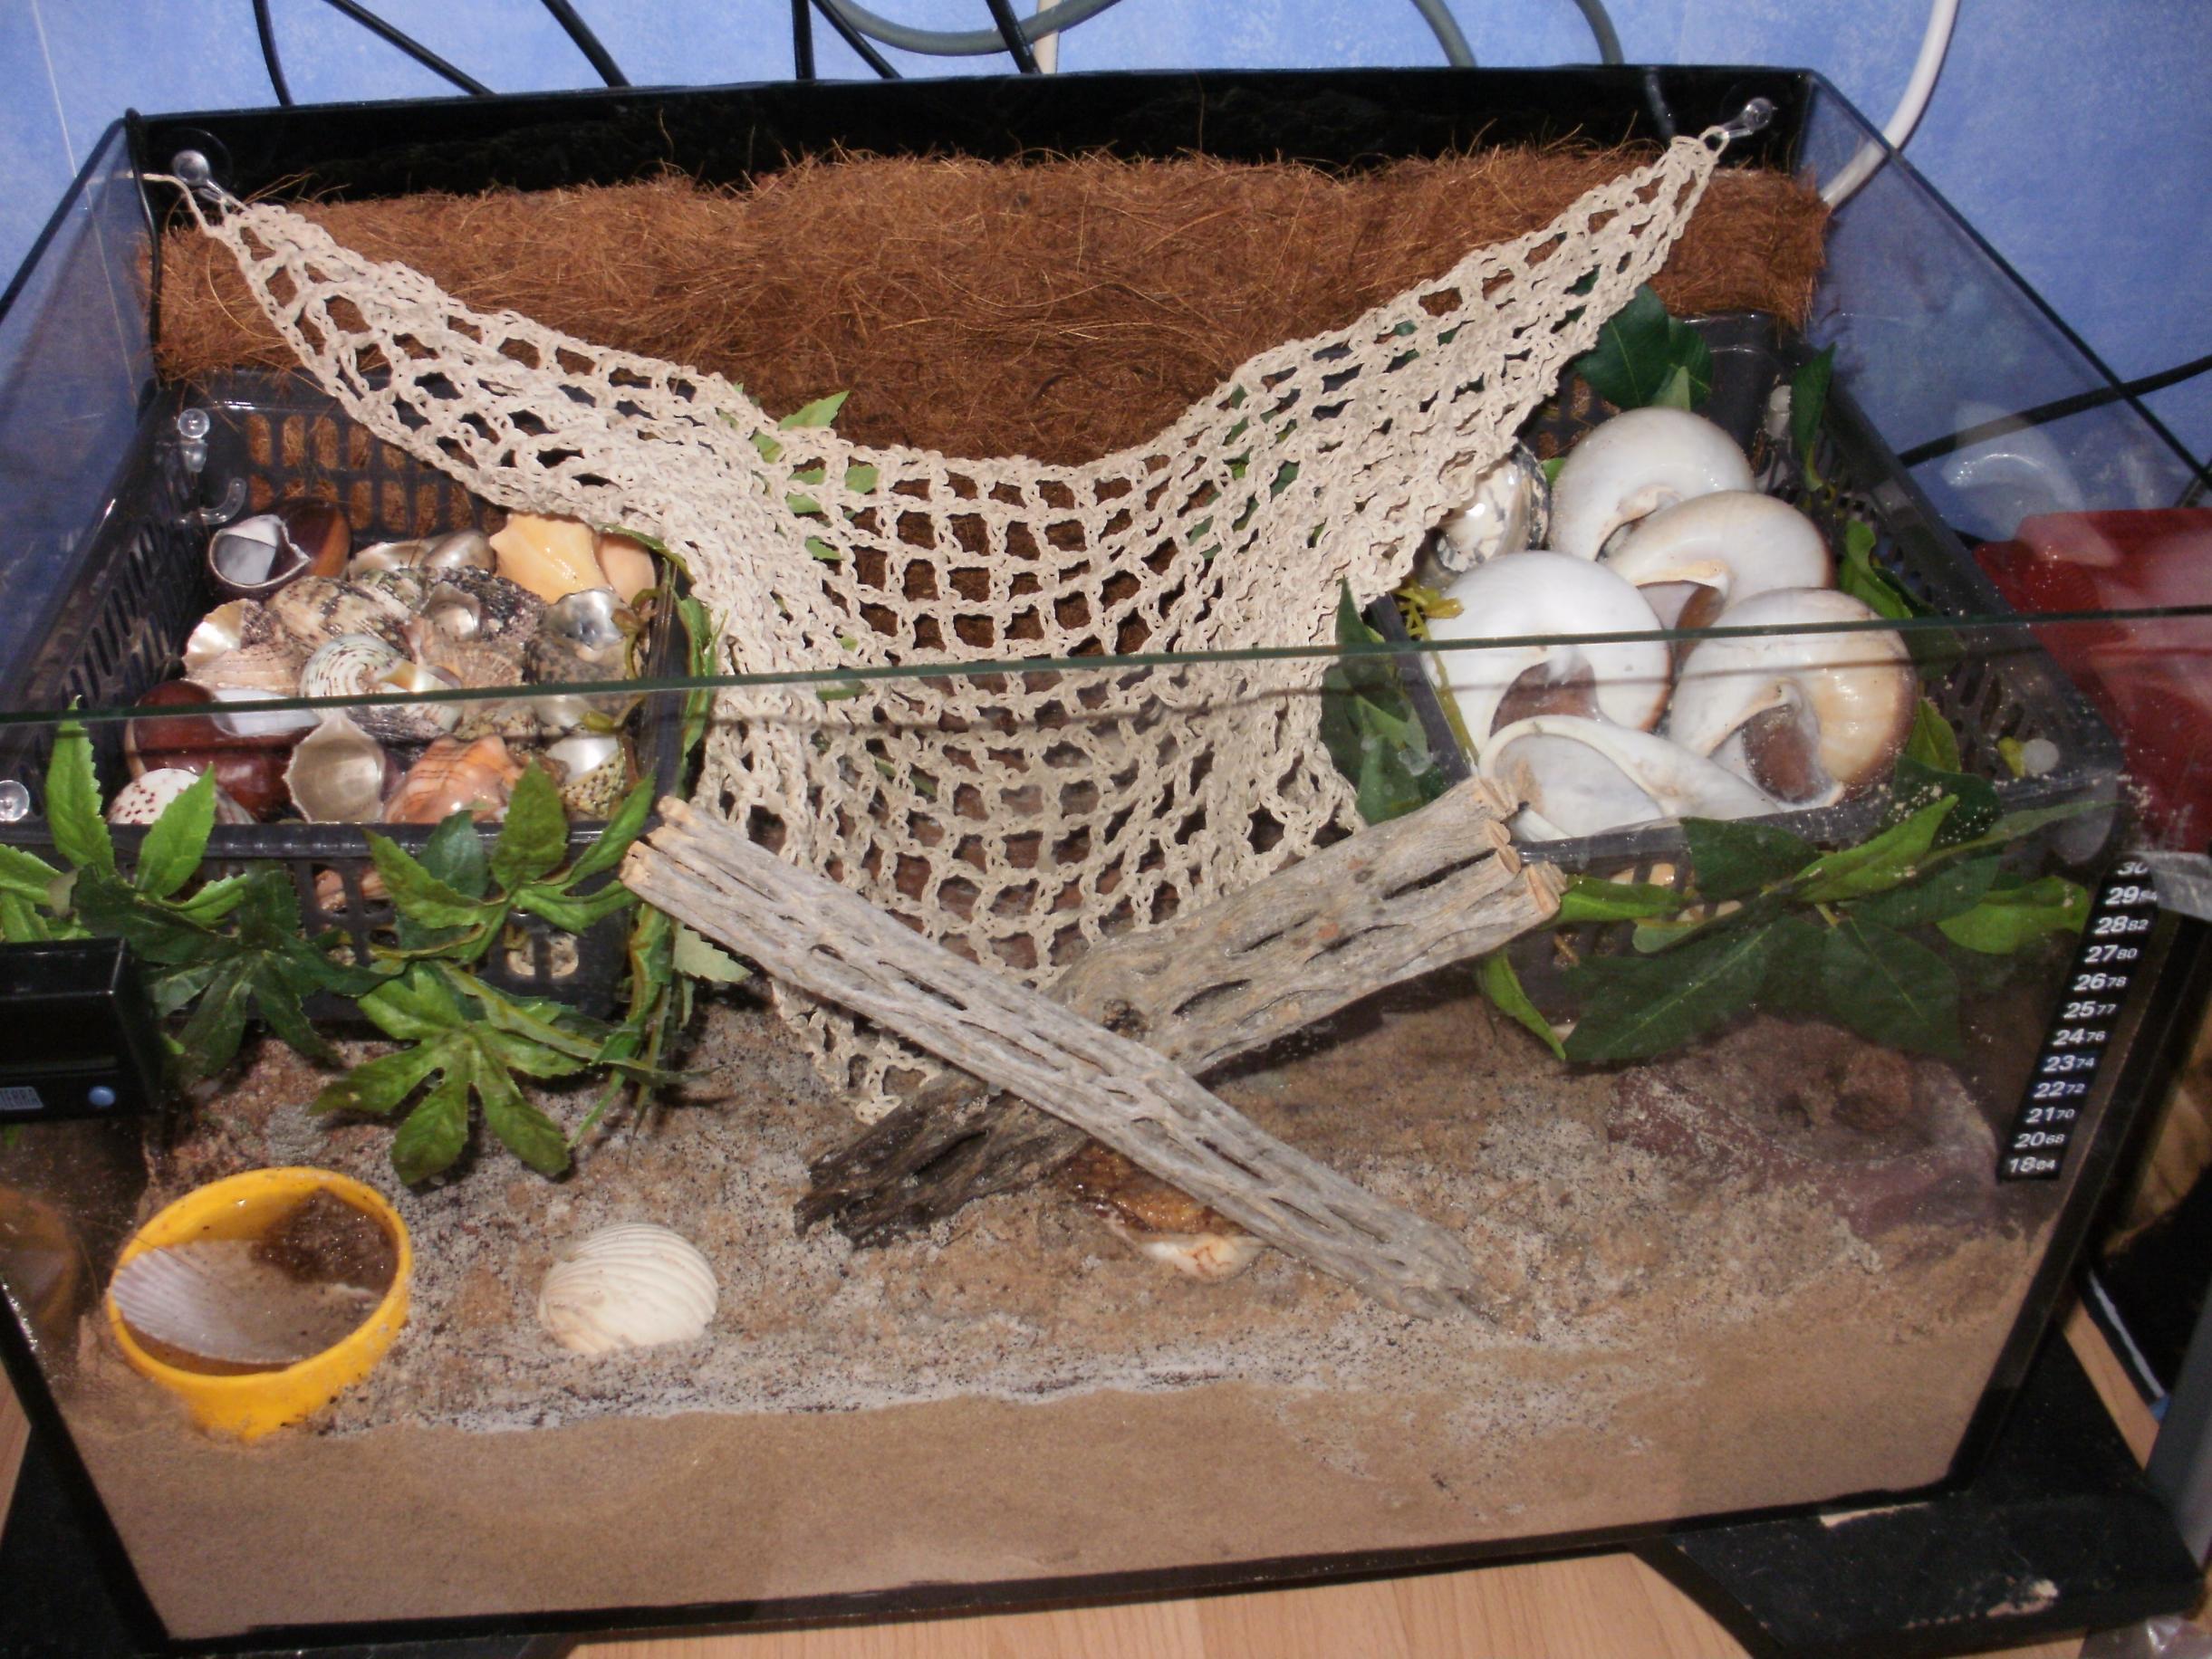 Pet hermit crab tanks - photo#24